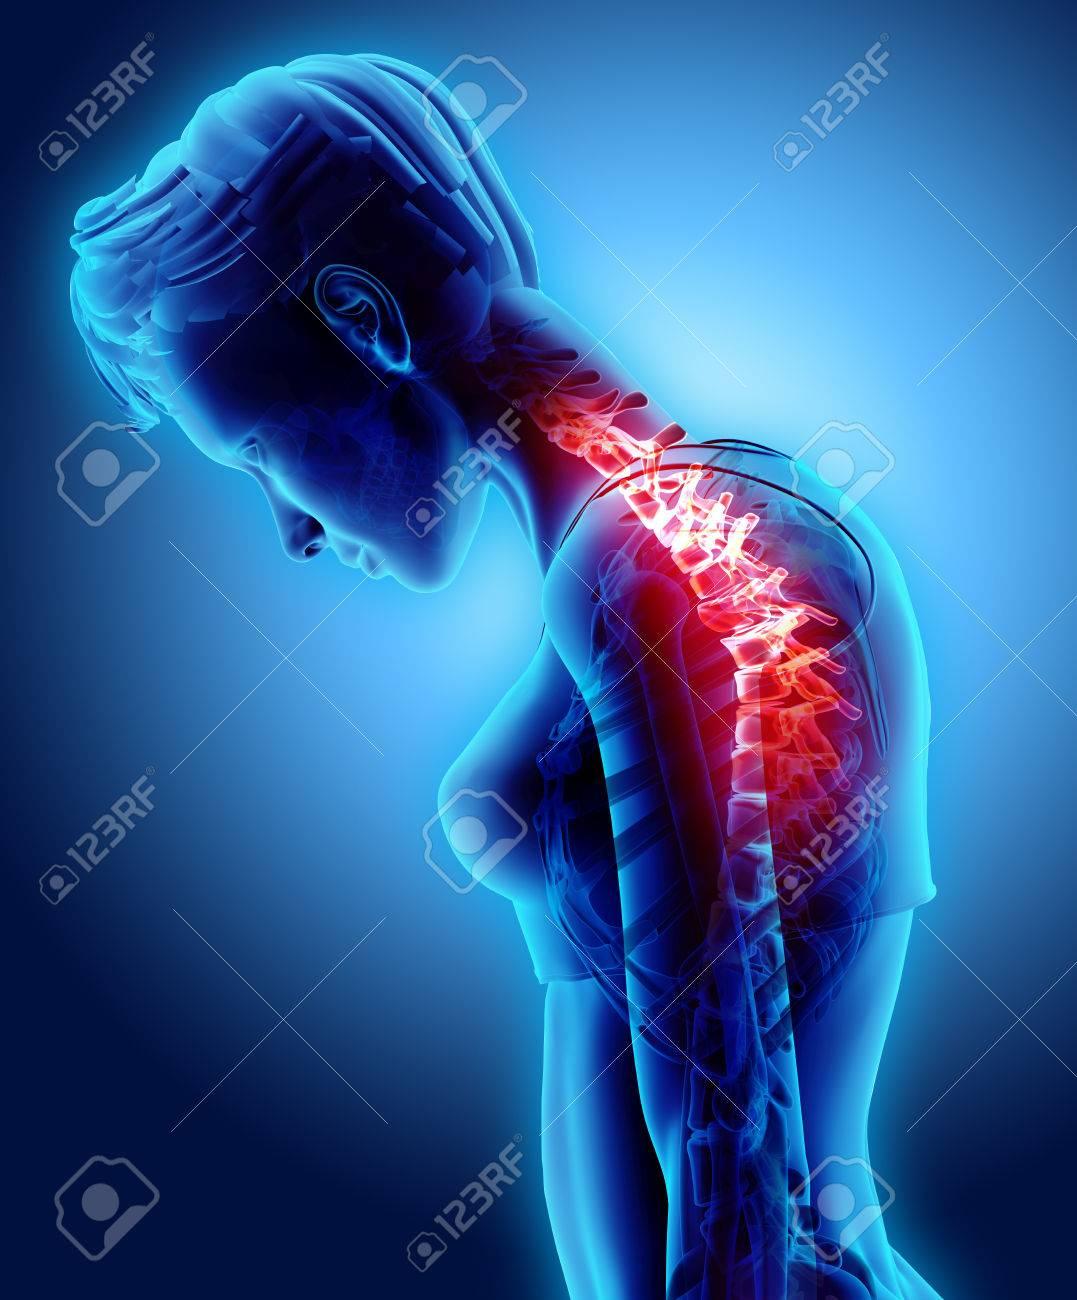 3D Illustration, Neck Painful - Cervical Spine Skeleton X-ray ...